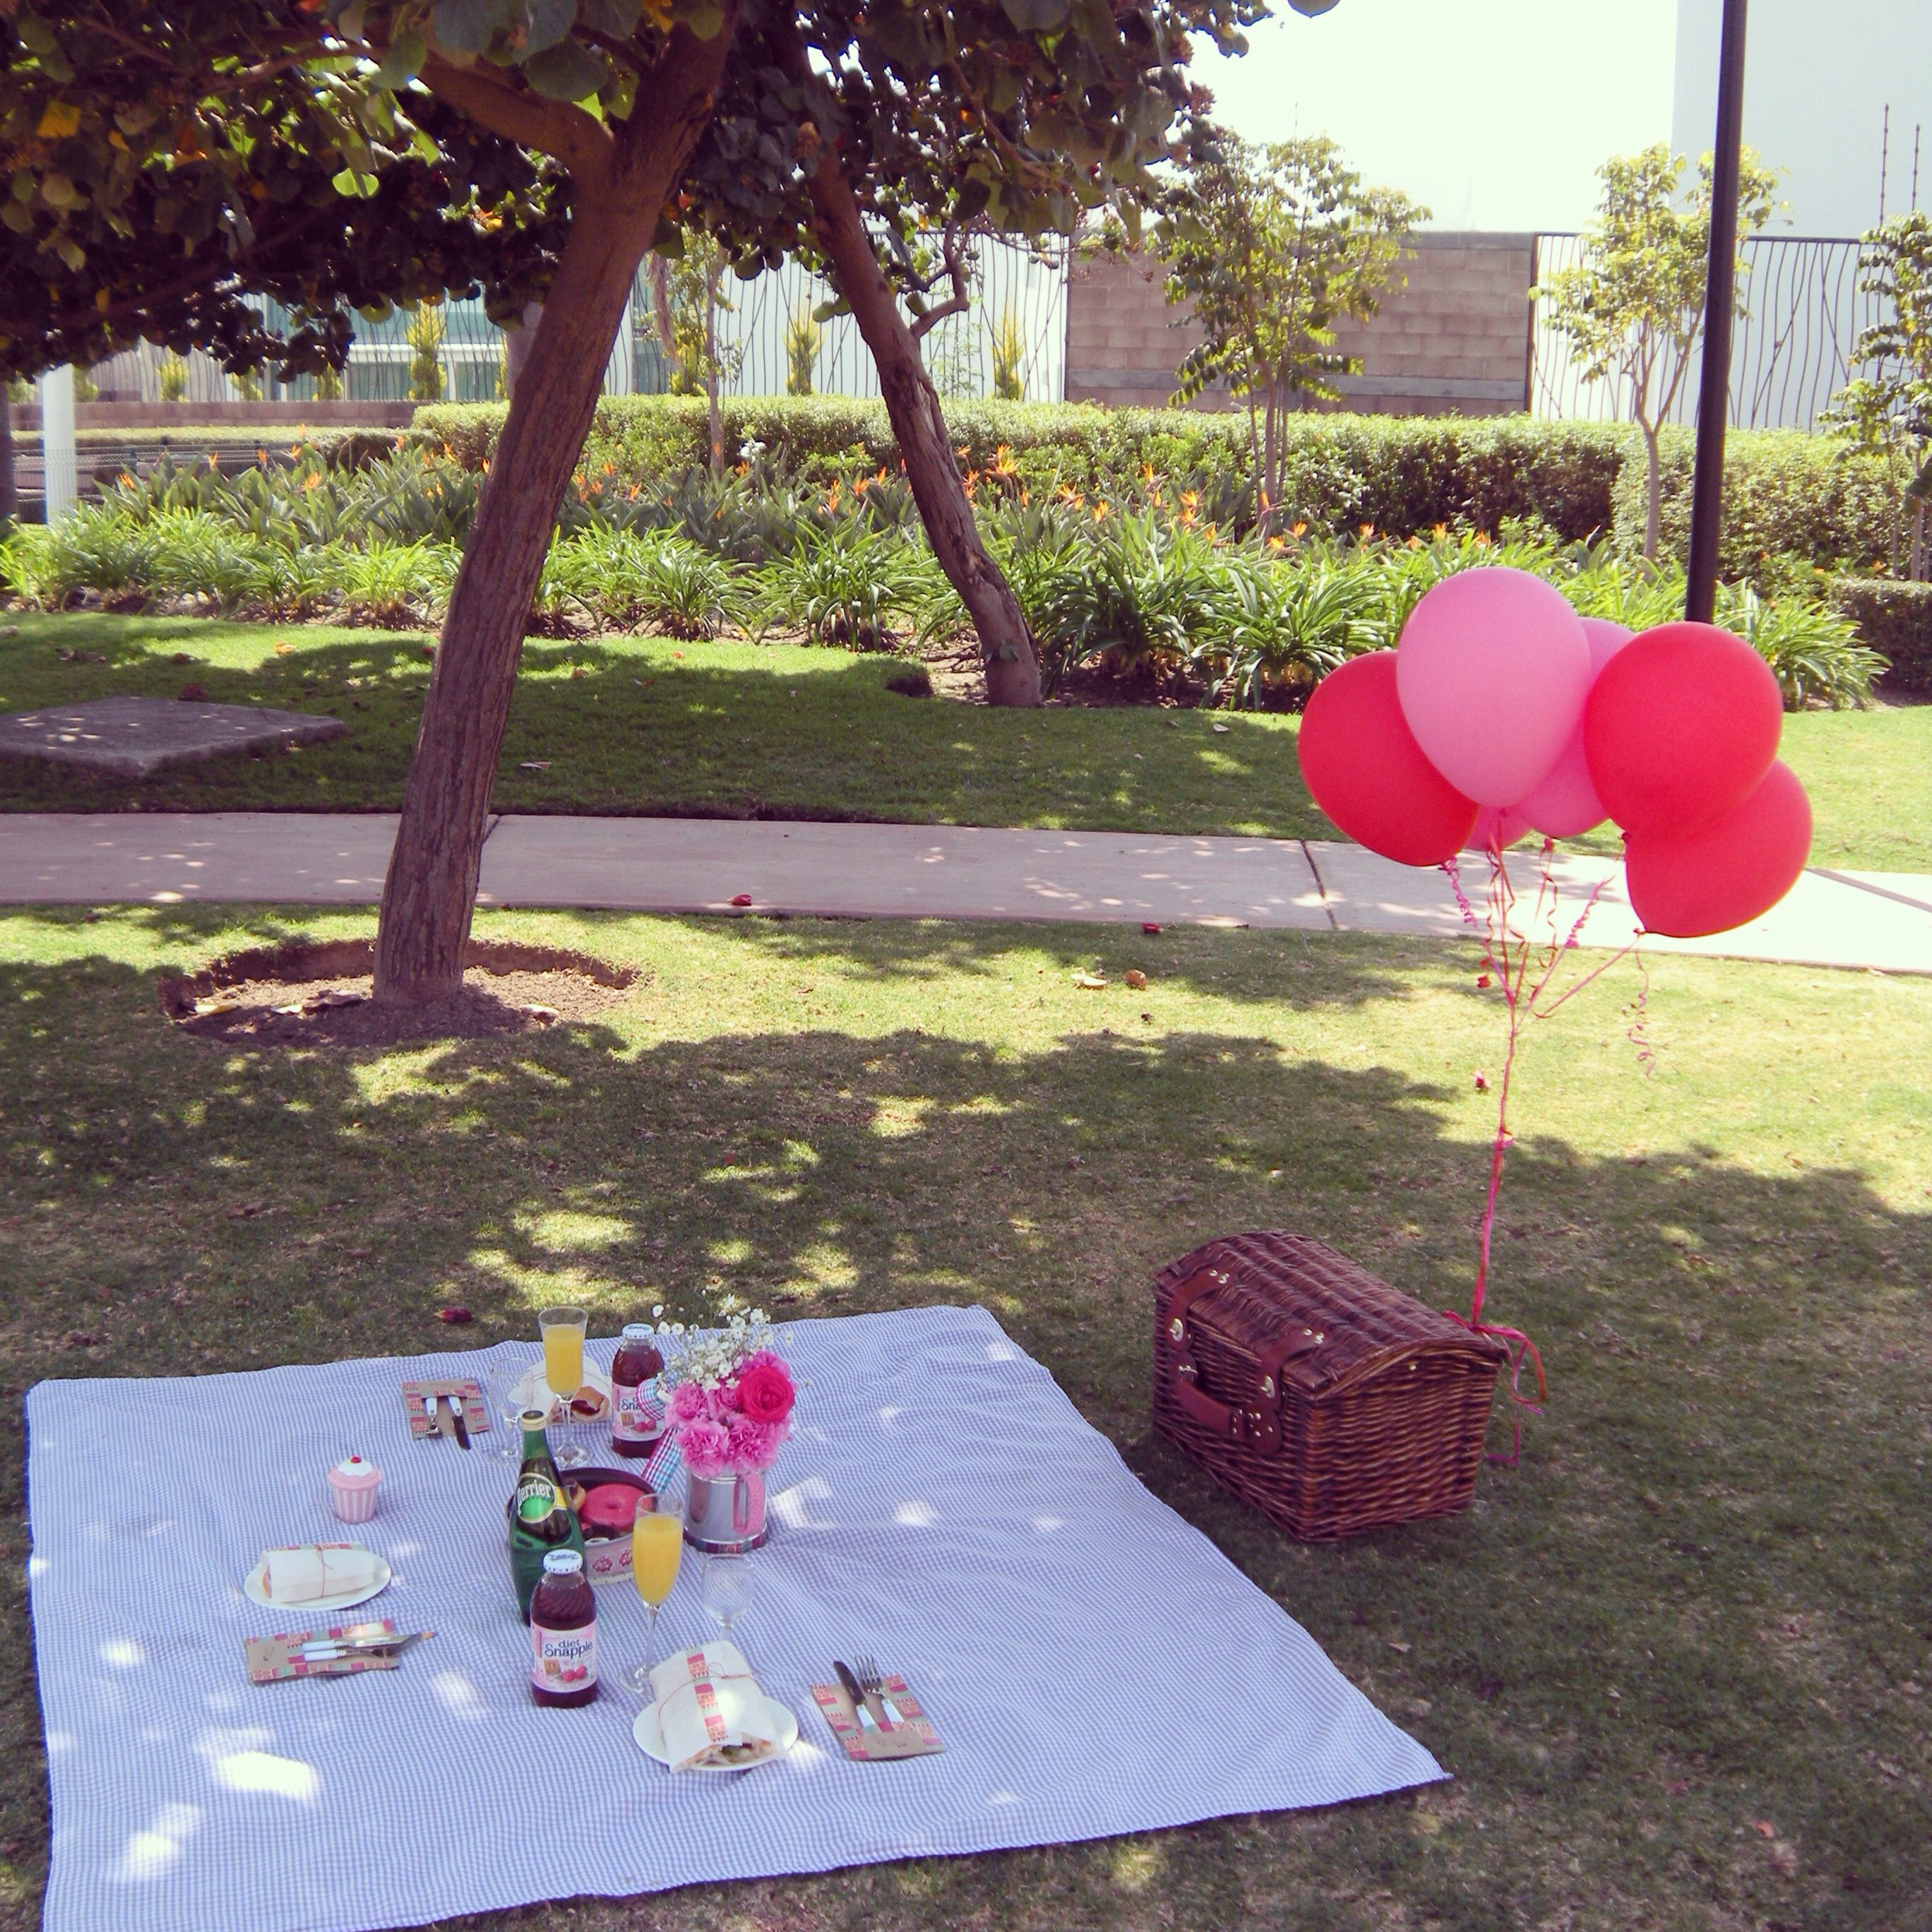 Picnic romantic picnics night picnic picnic date